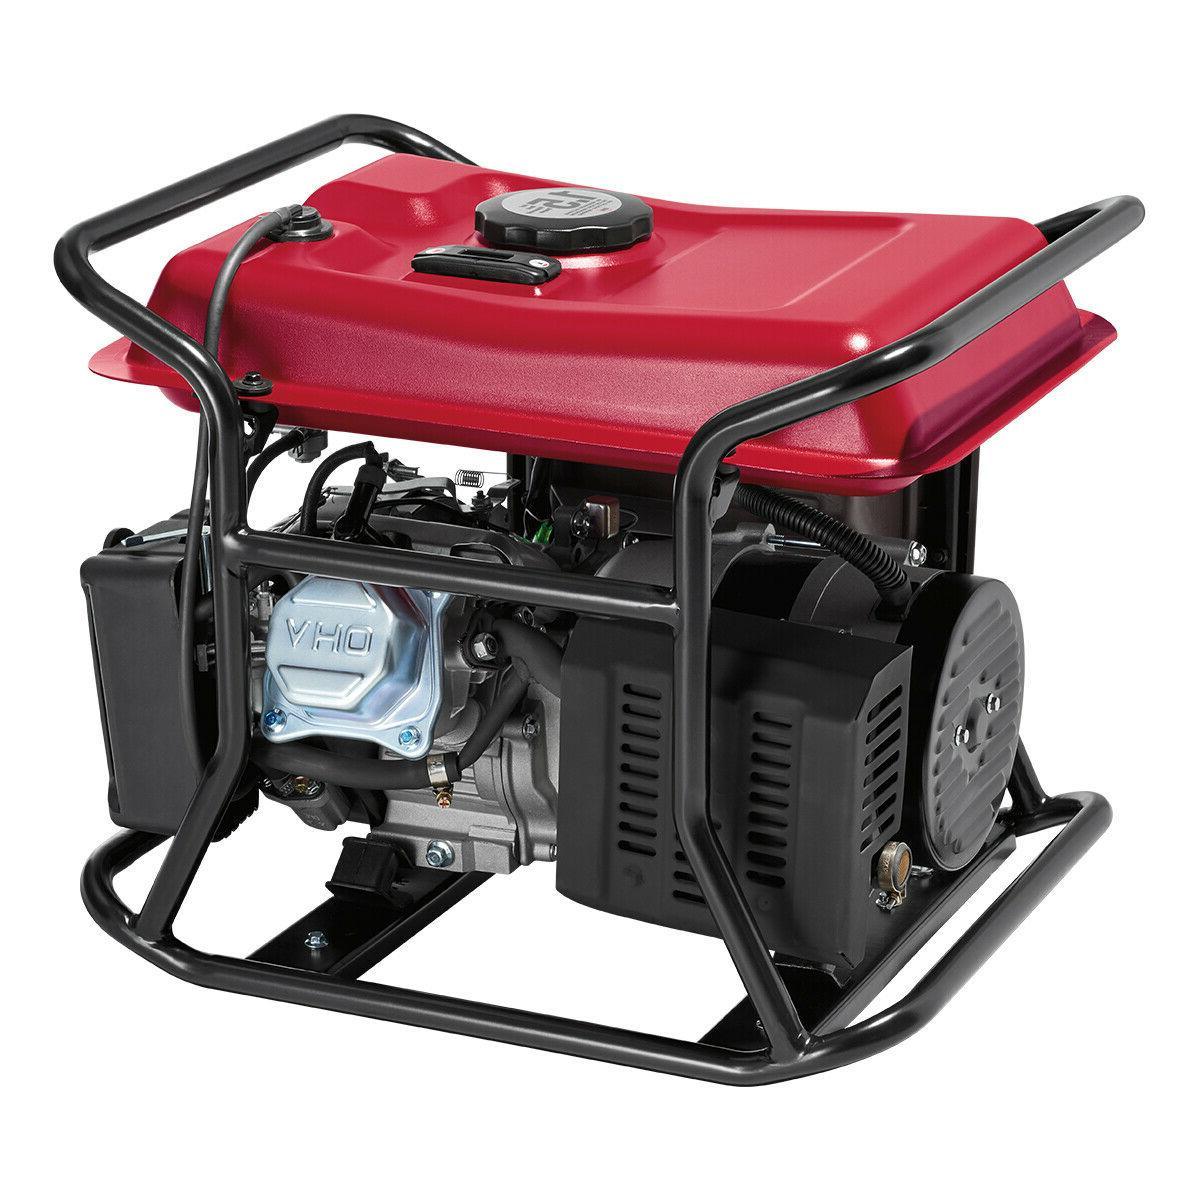 Powermate CX1400 Watt Portable 49 State /